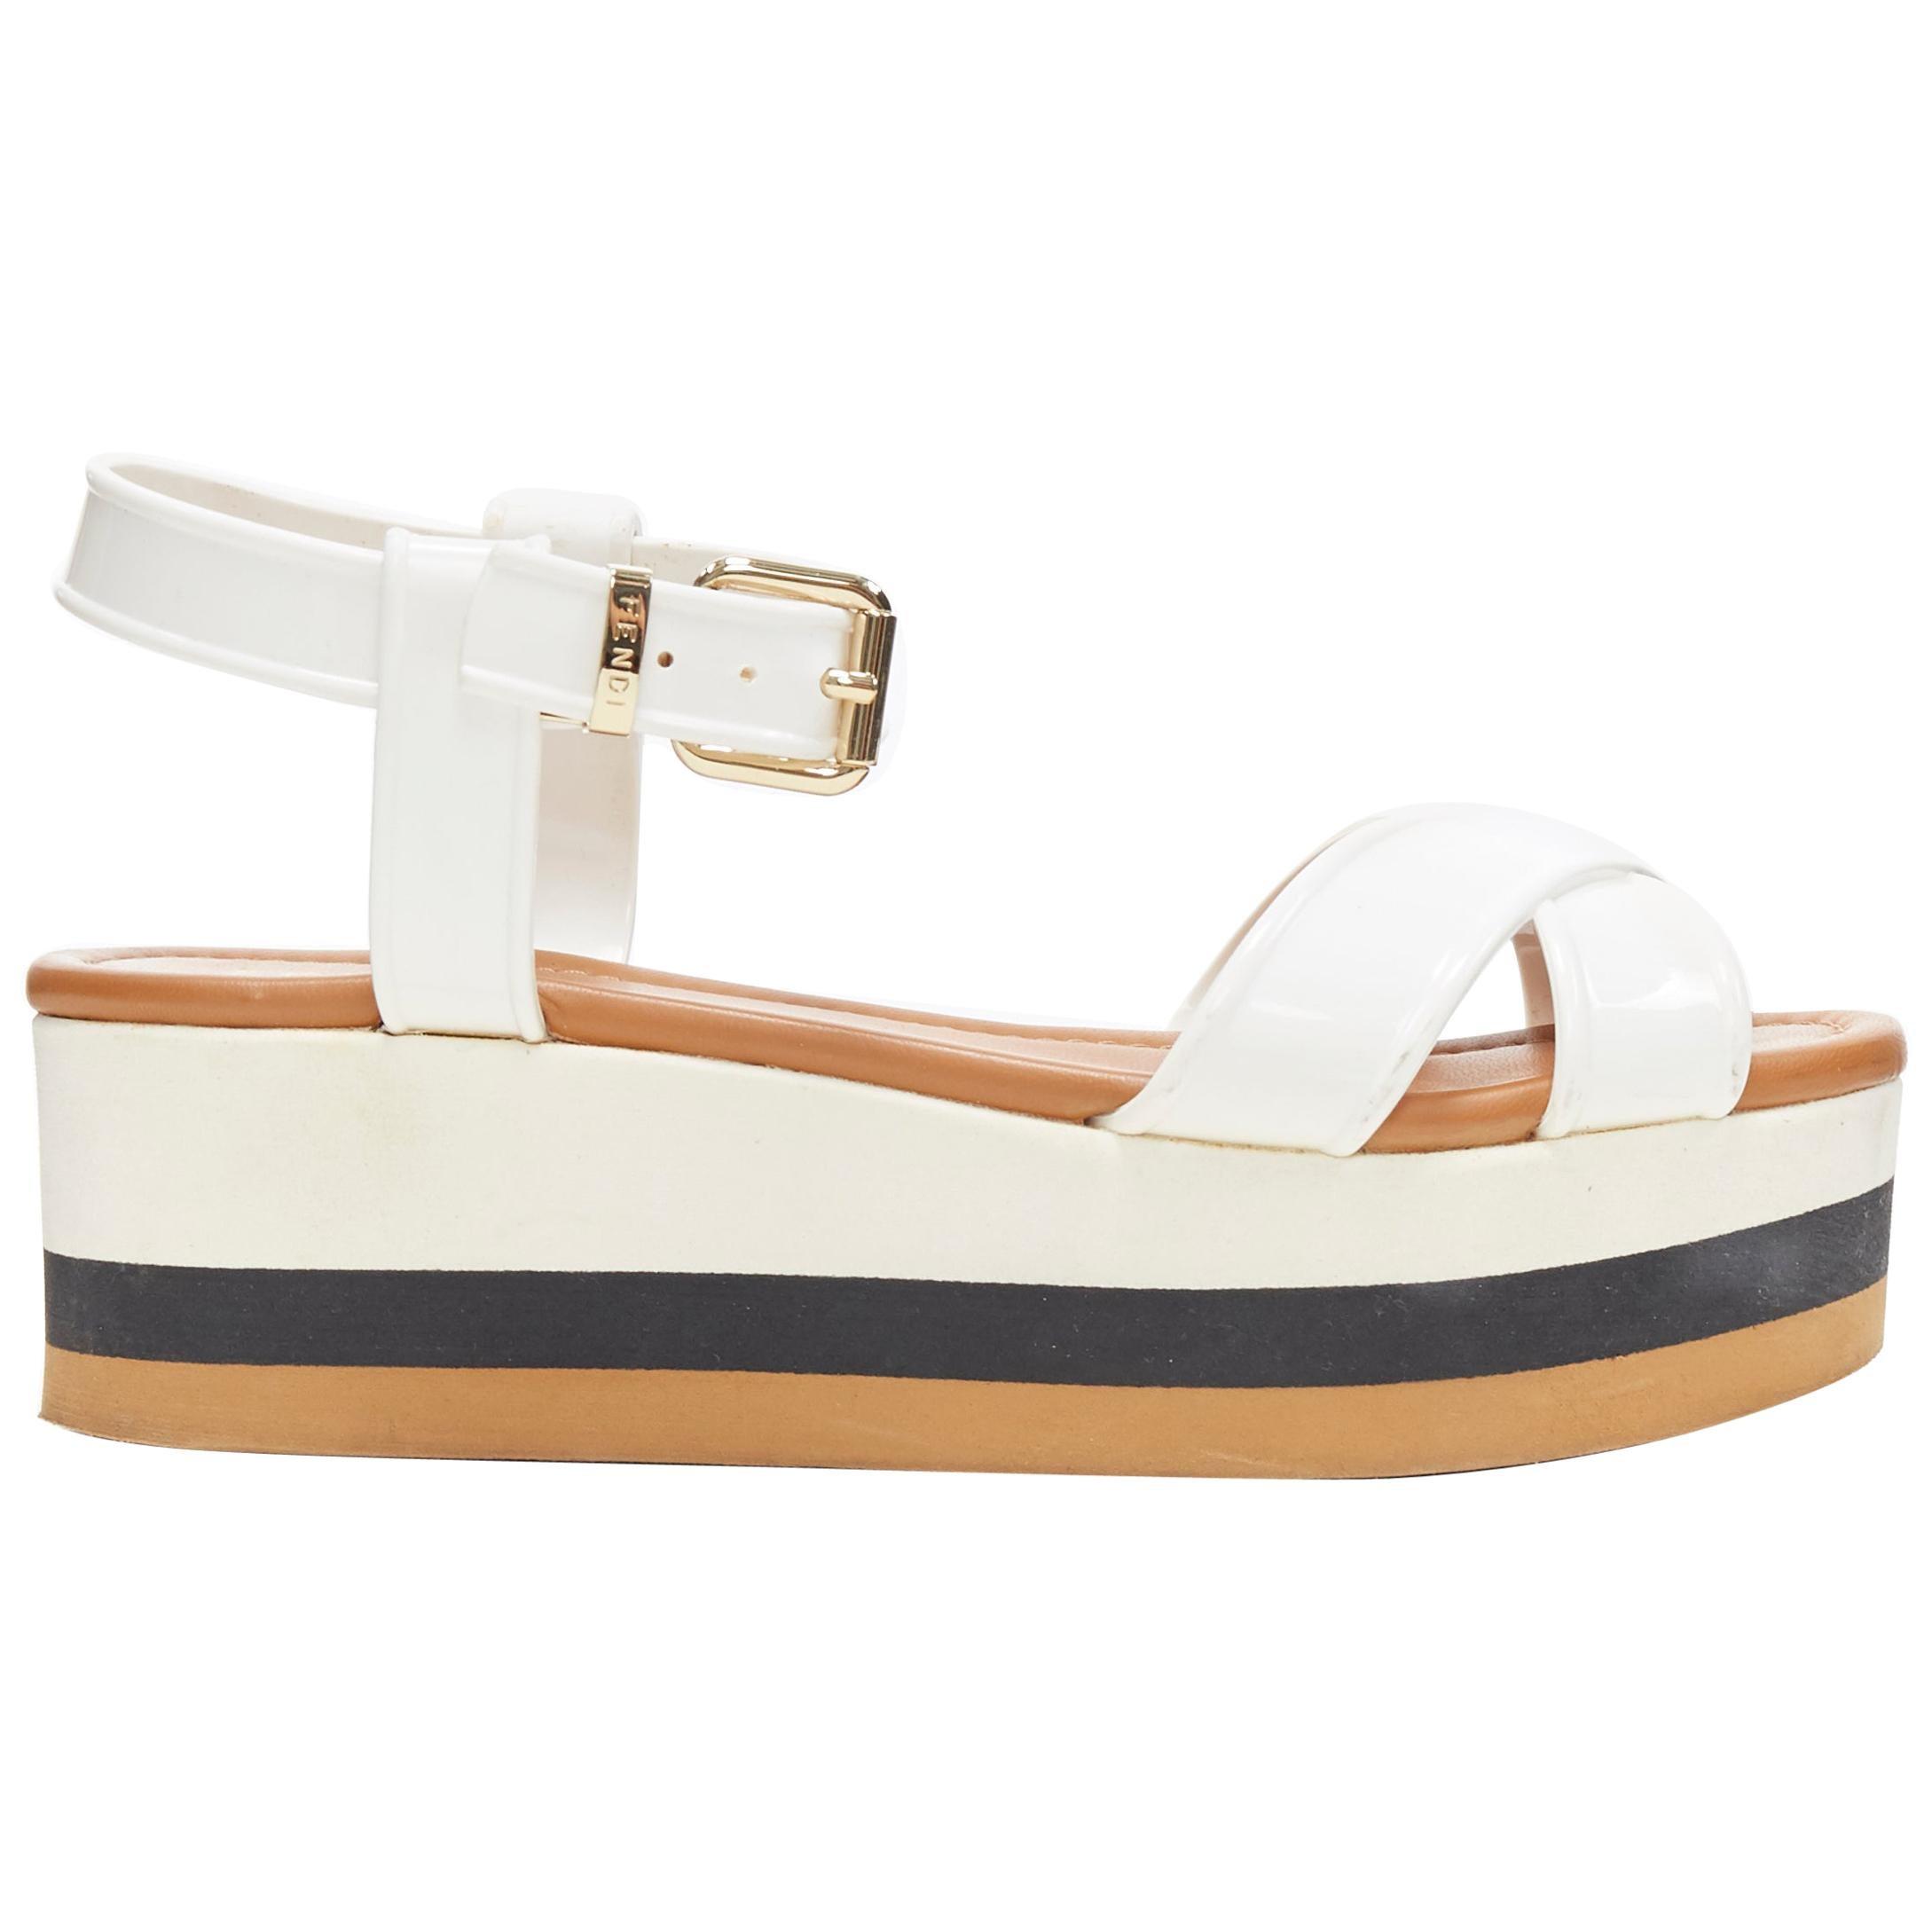 FENDI white jelly rubber ankle strap beige tricolor flat platform sandals EU36